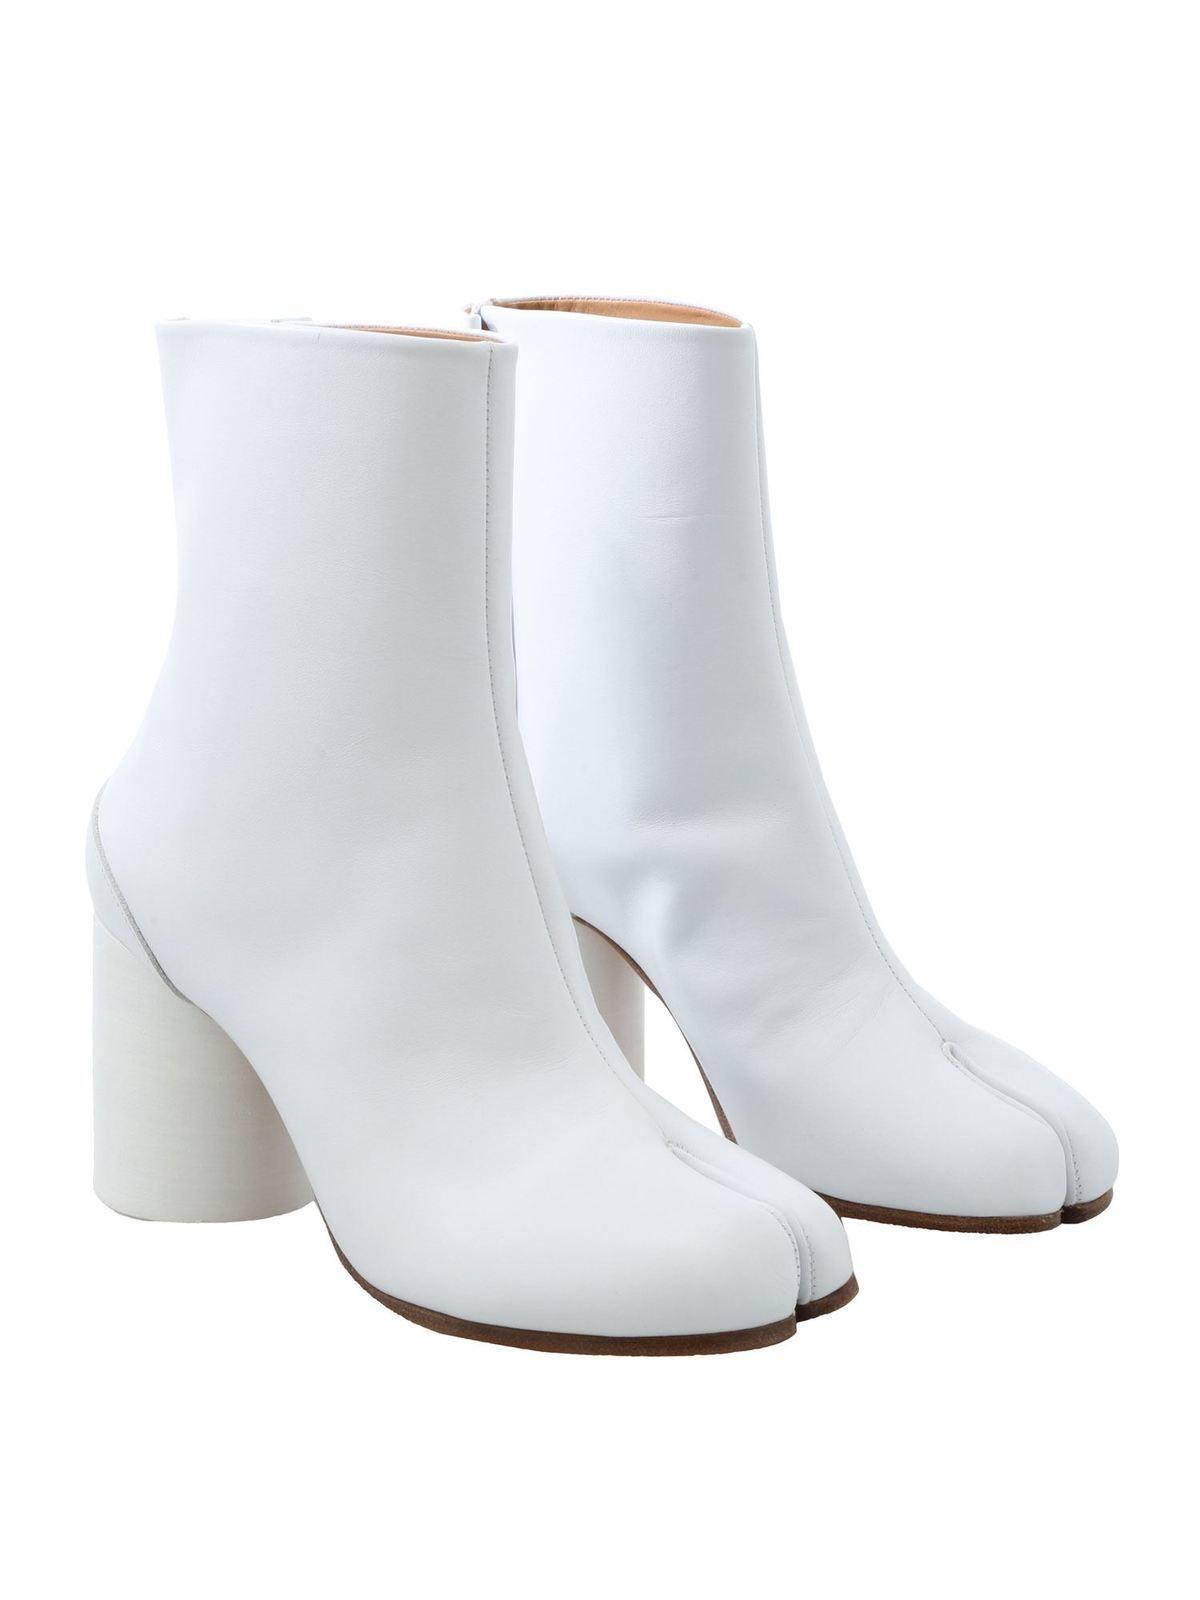 Maison Margiela - White Tabi ankle